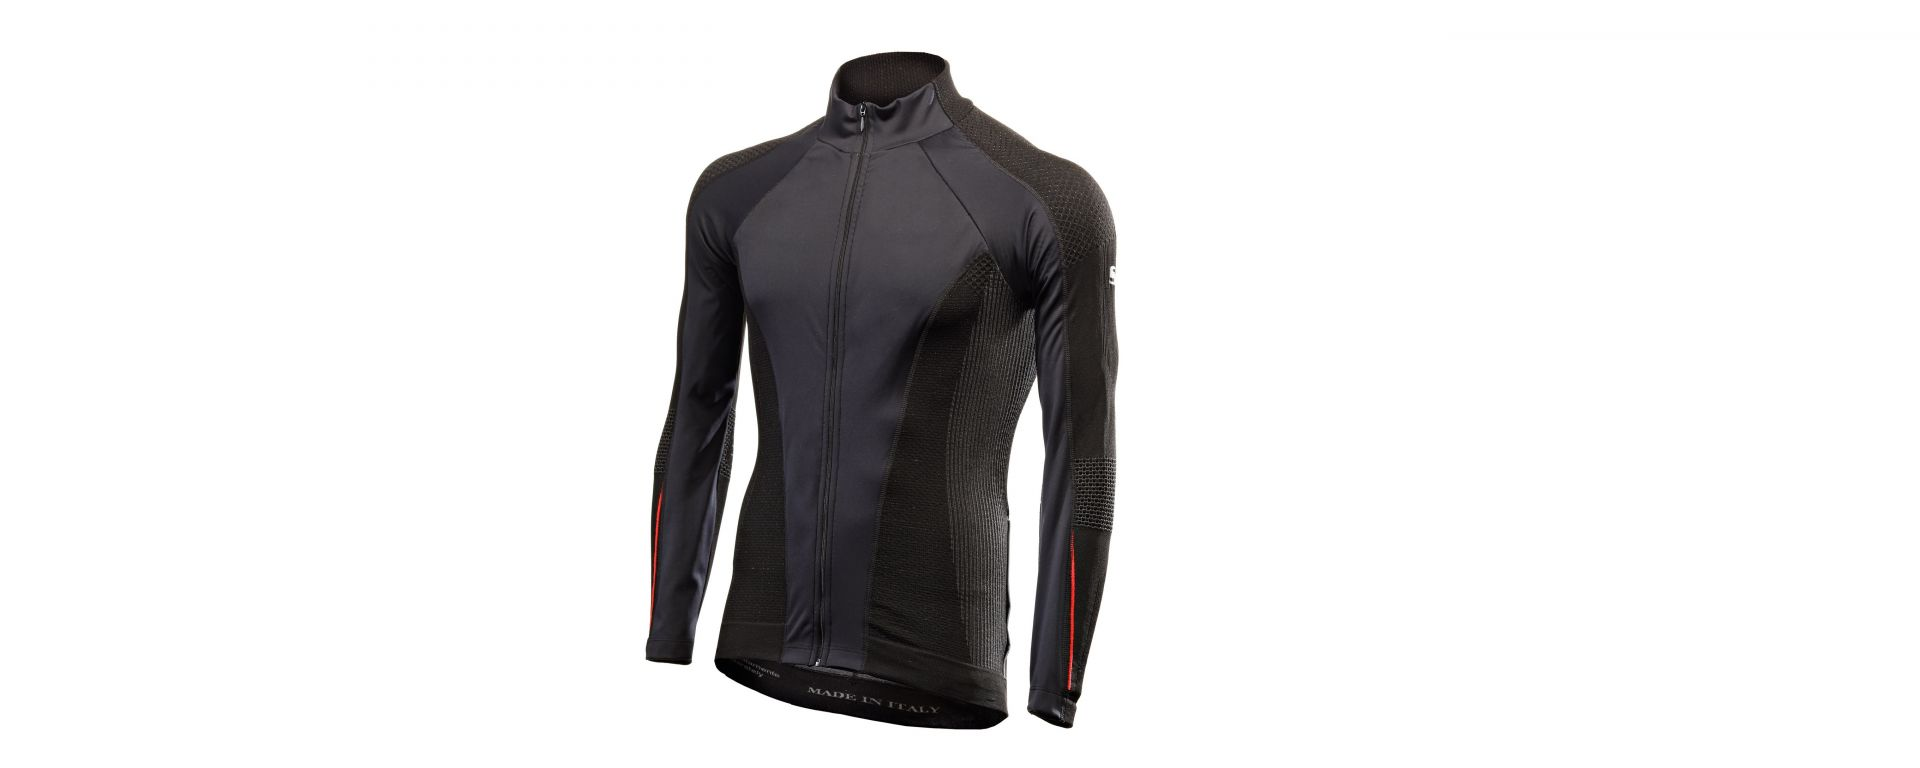 Wind Jersey WT: la nuova giacca invernale di Sixs